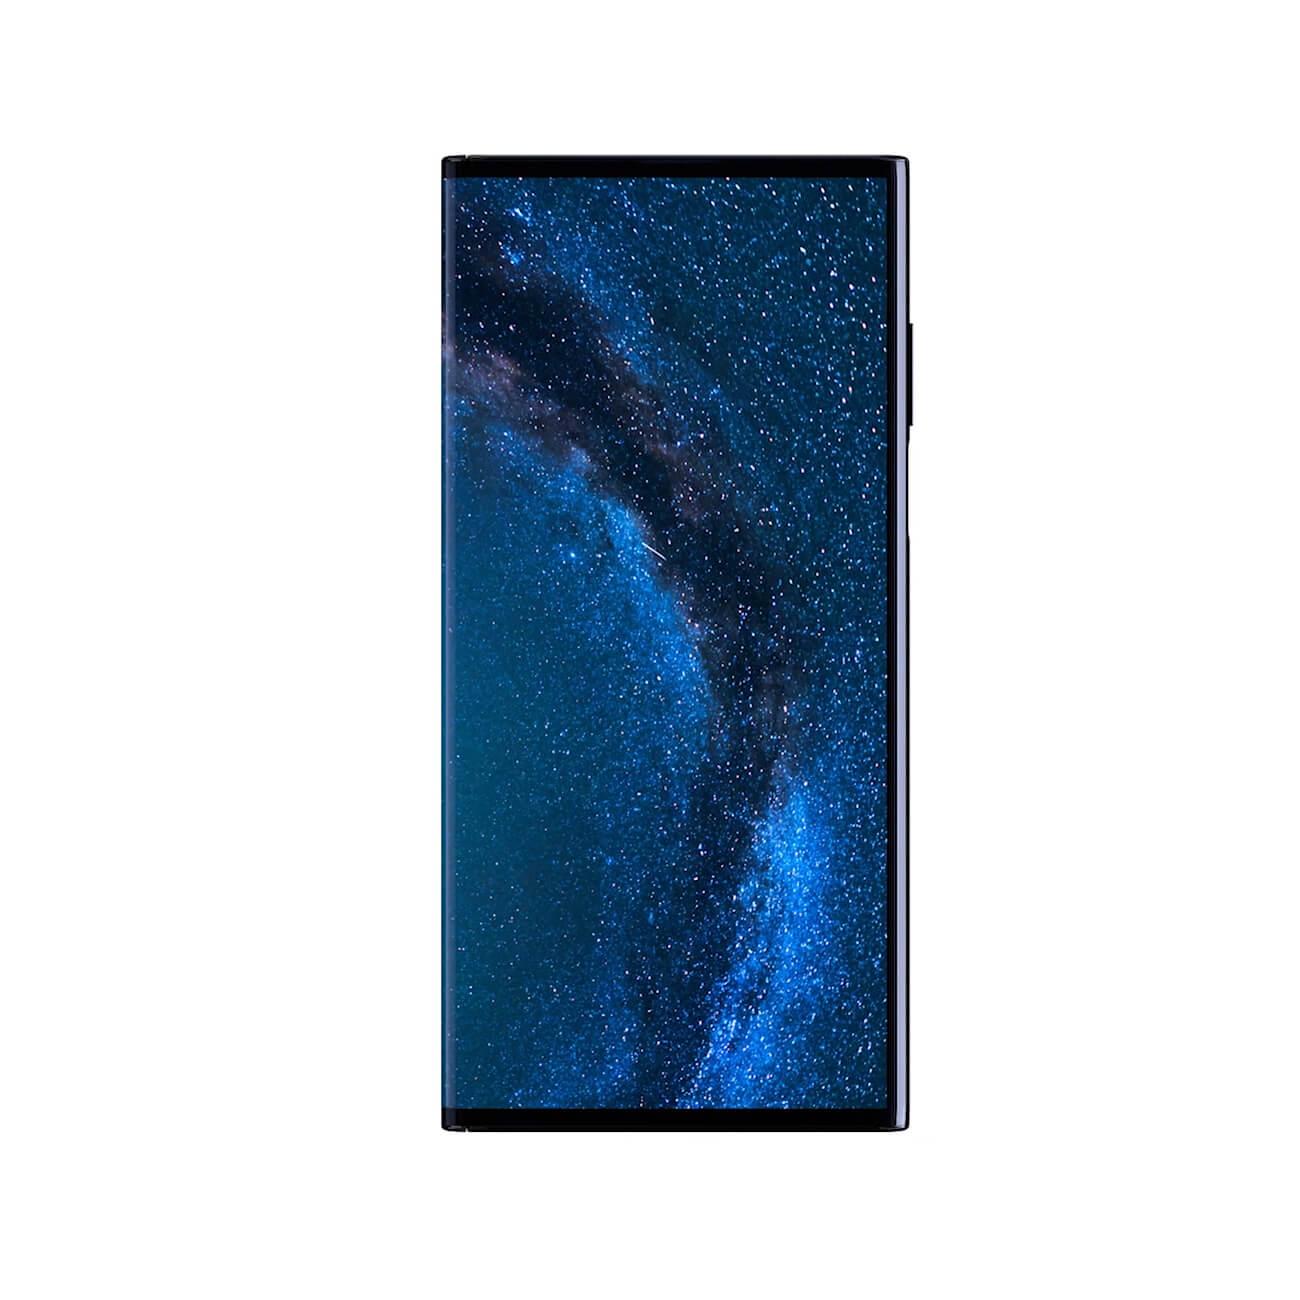 Huawei Mate X Unveiled - A Galaxy Fold Killer Already? 9